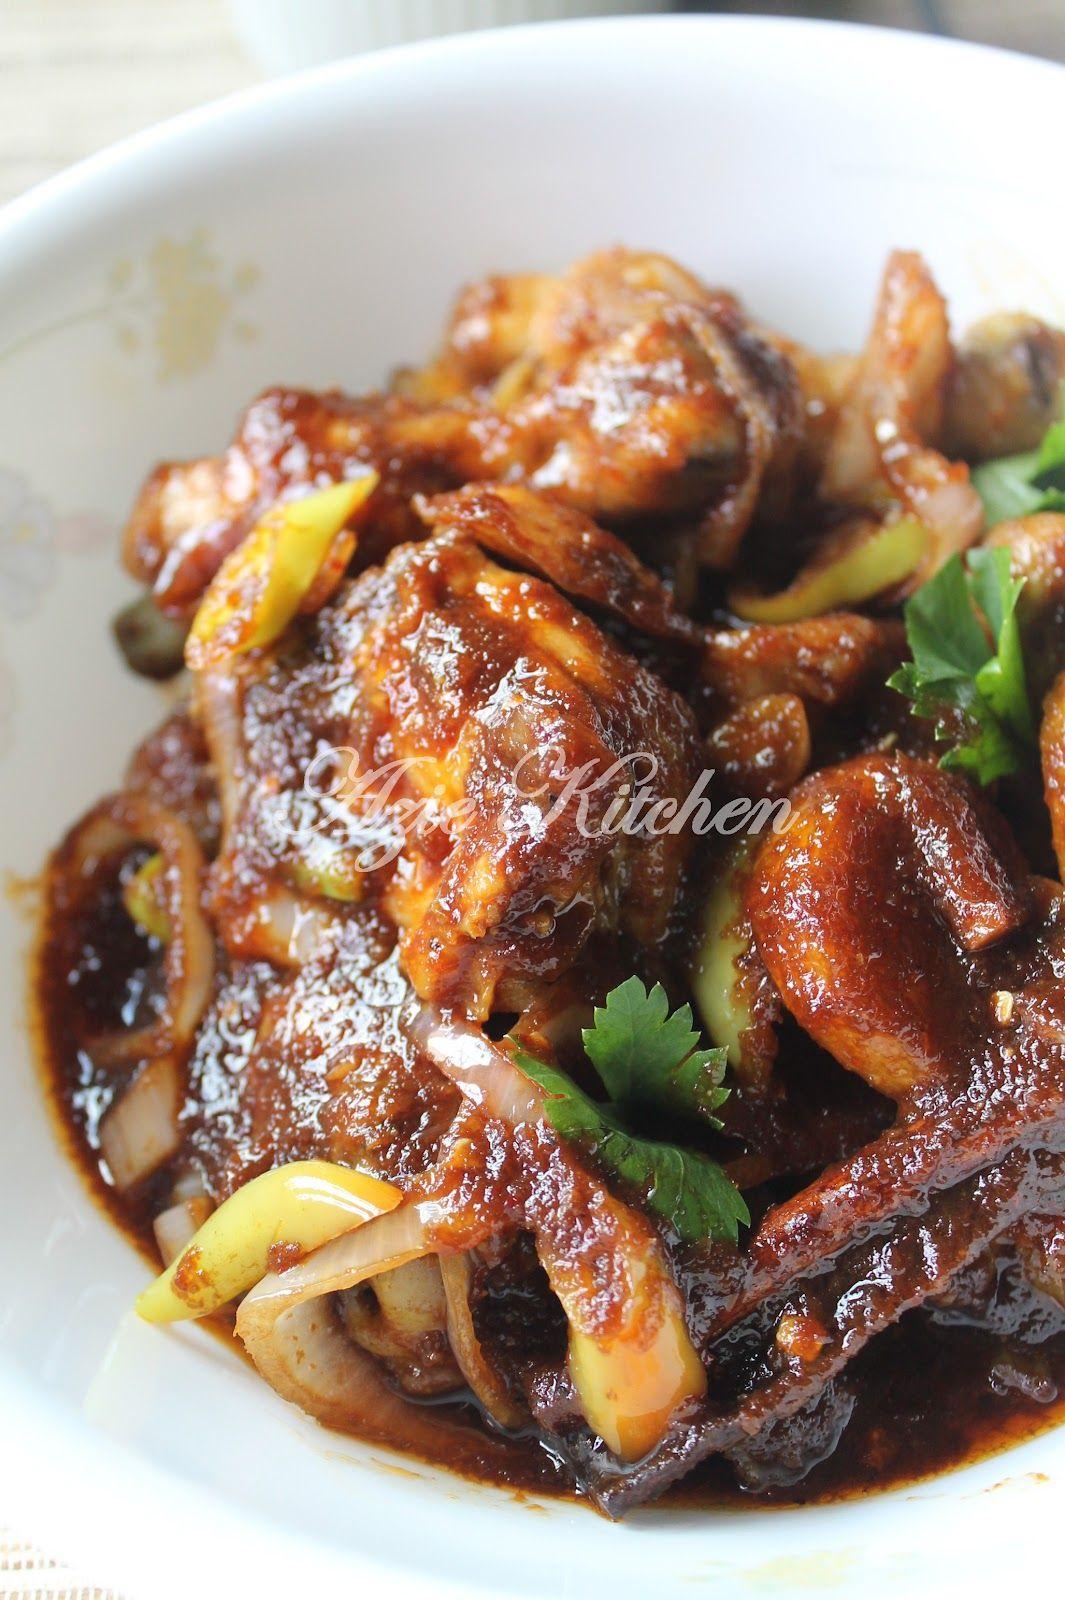 Azie Kitchen Ayam Masak Kicap Pedas Yang Sedap Spicy